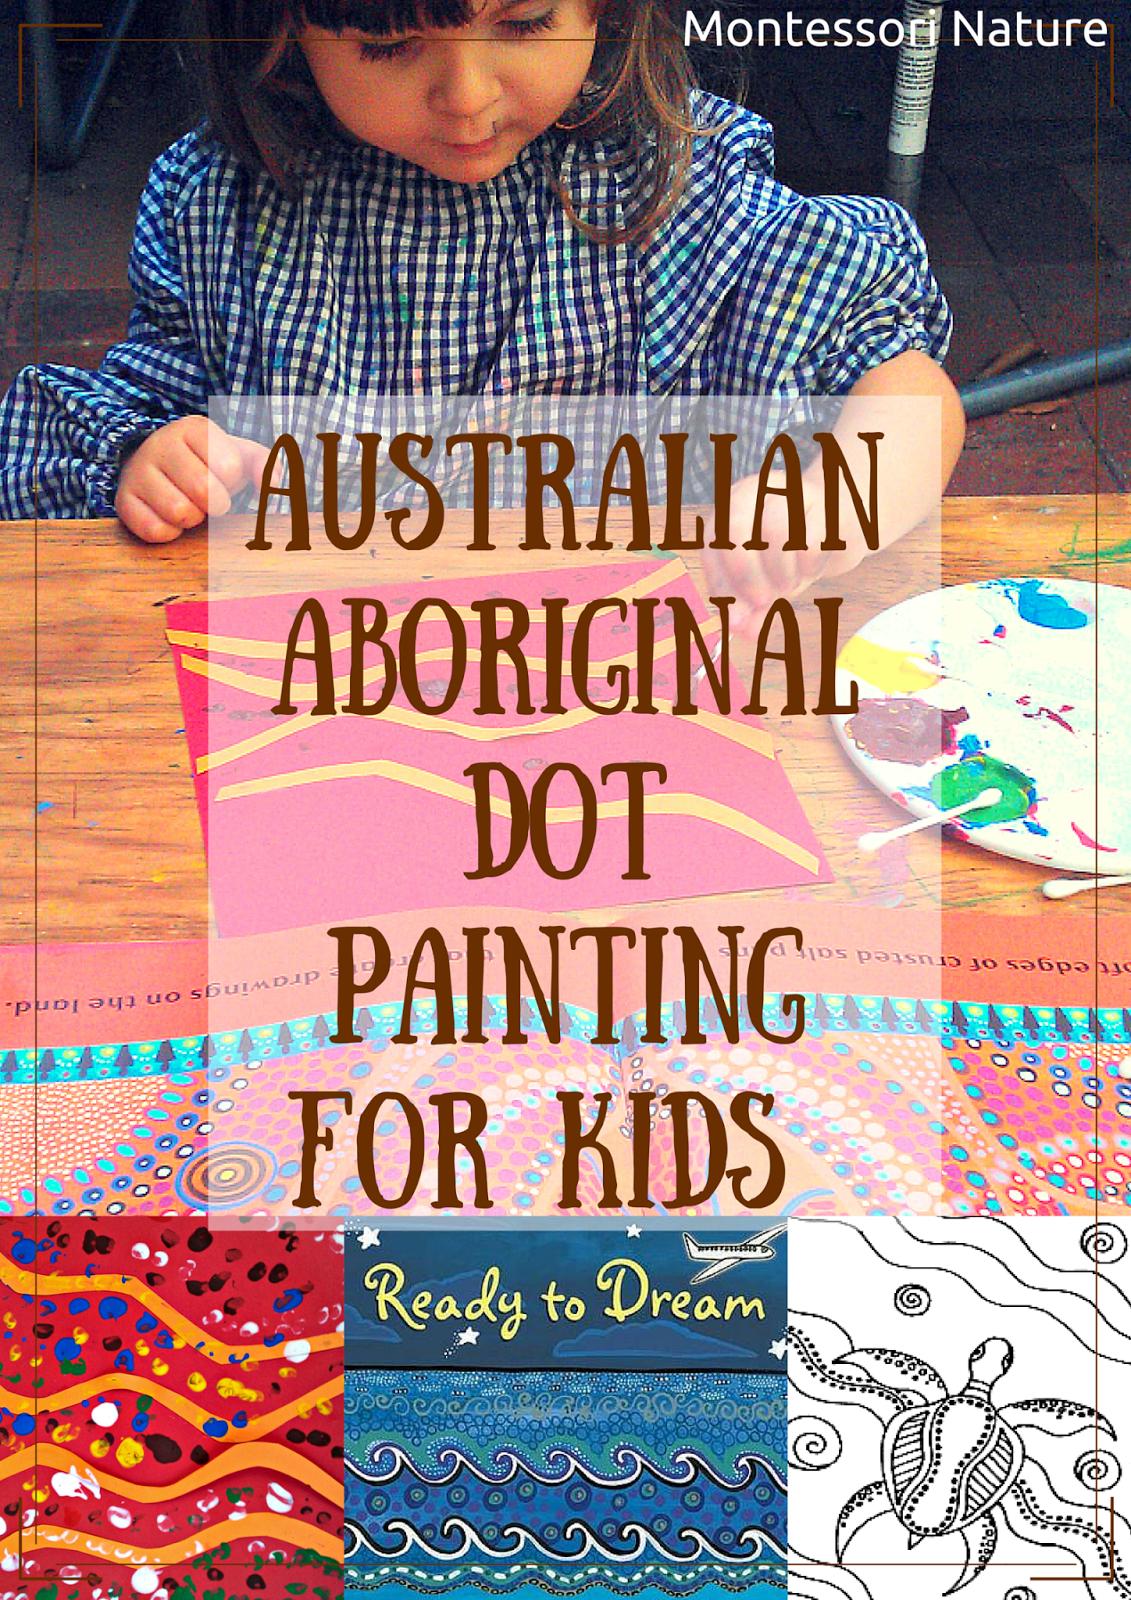 Australian Aboriginal Dot Painting For Kids And Art